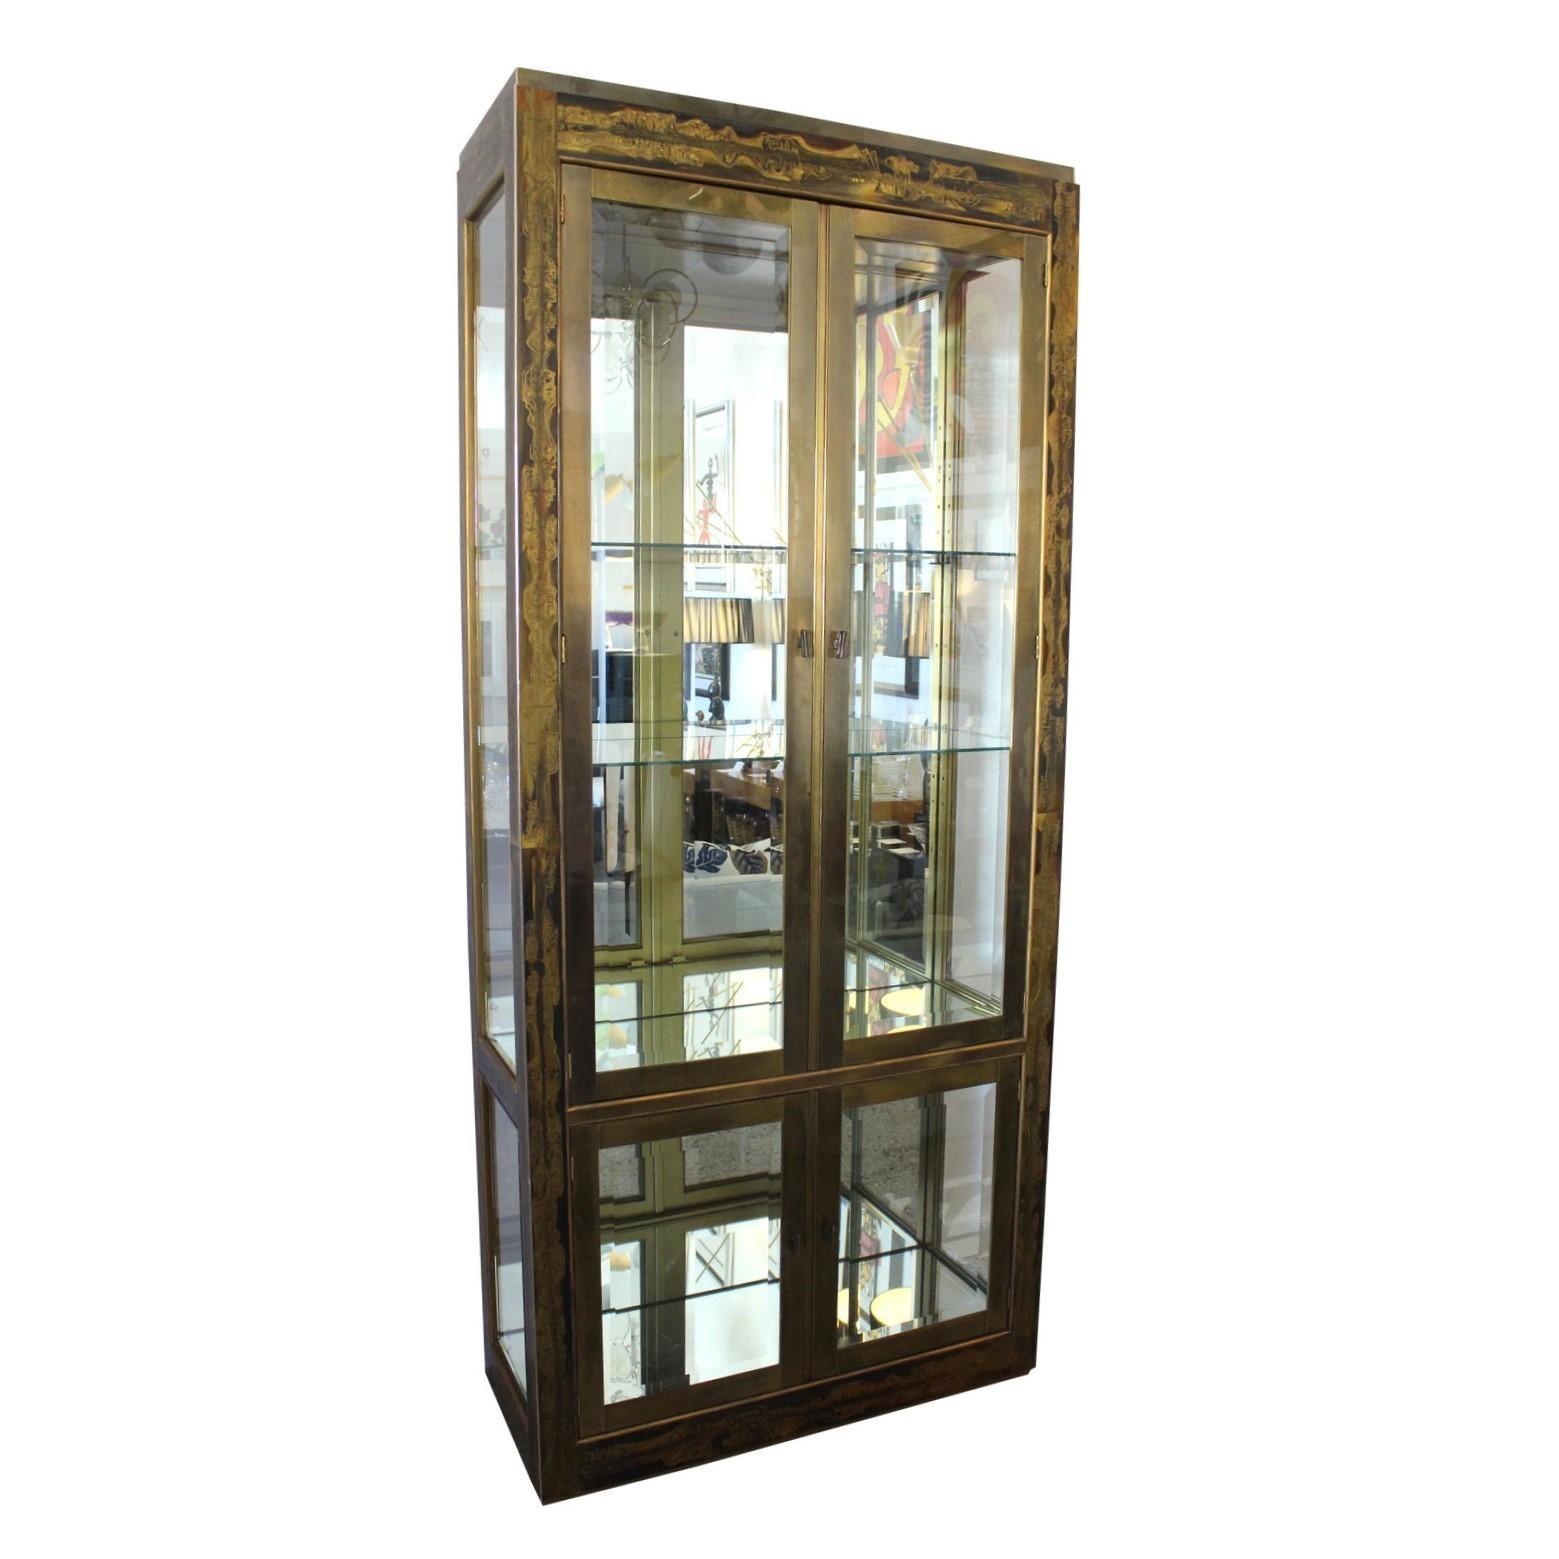 Bernhard Rohne for Mastercraft Display Cabinet Anodized Aluminum Brass